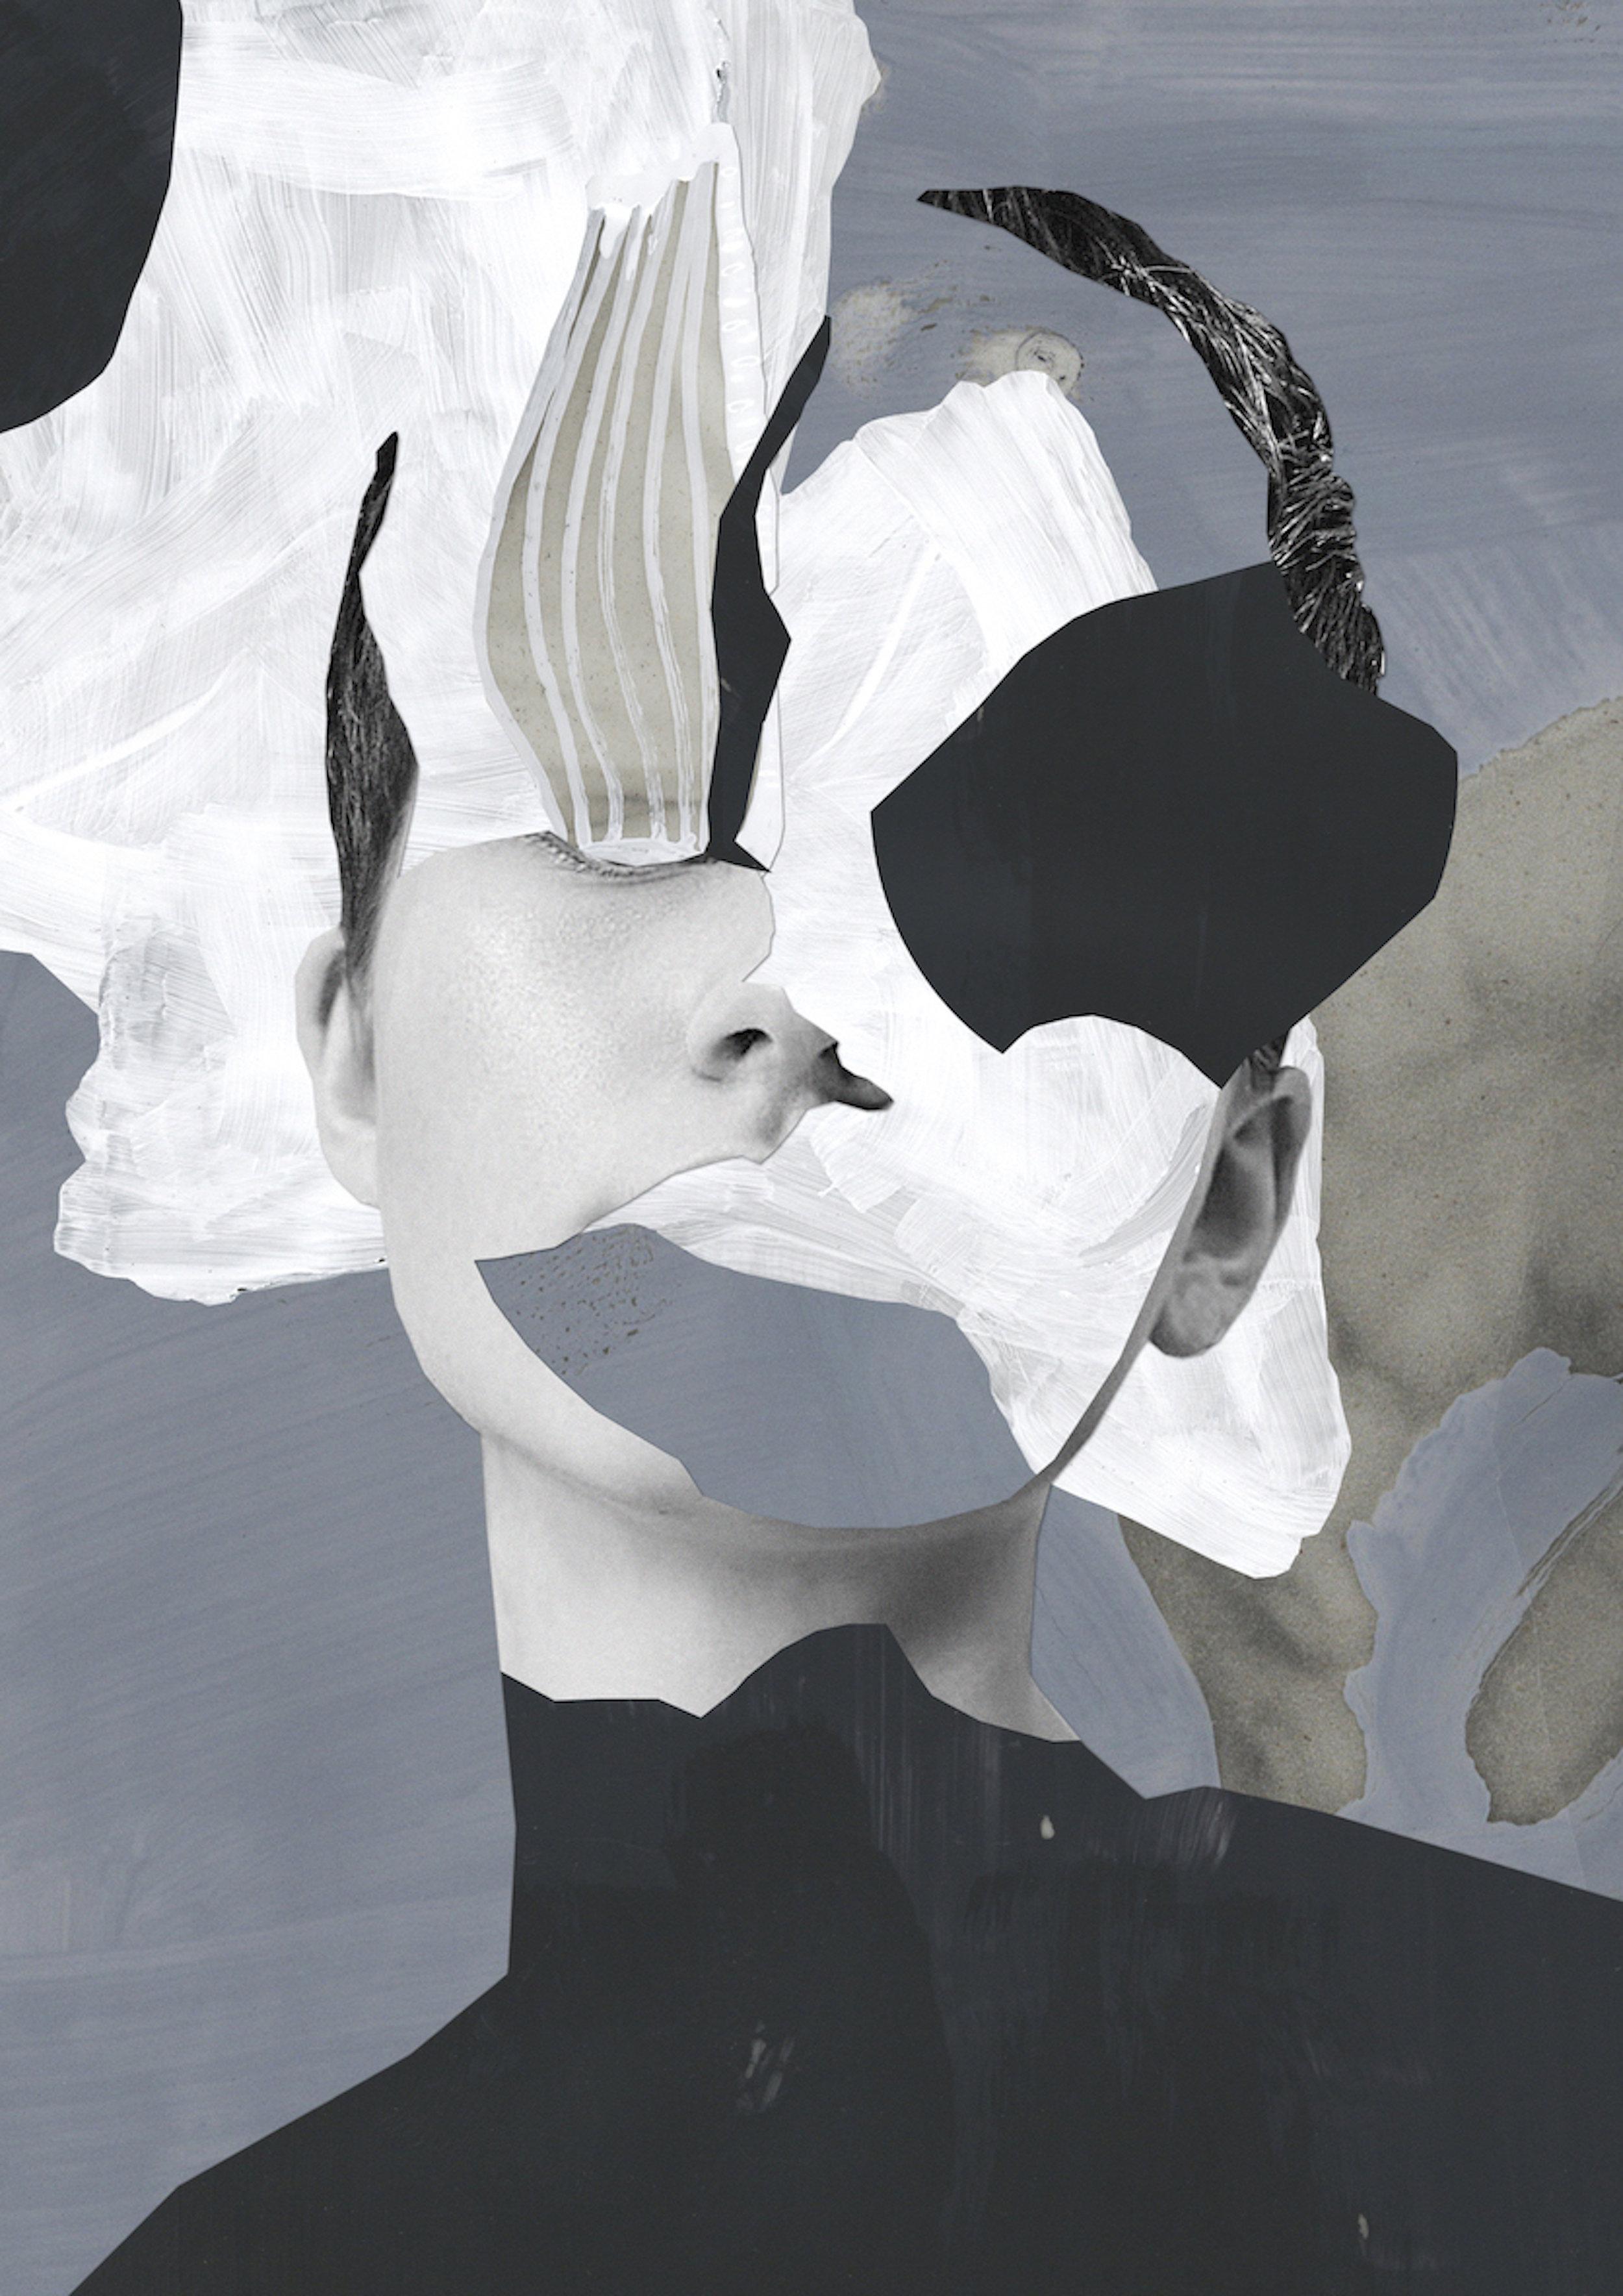 Nadia Arnold Ltd_Stefan Gunnesch_ Transformation_2018_Collage on paper_20 x 30 cm_ USD 500.jpeg